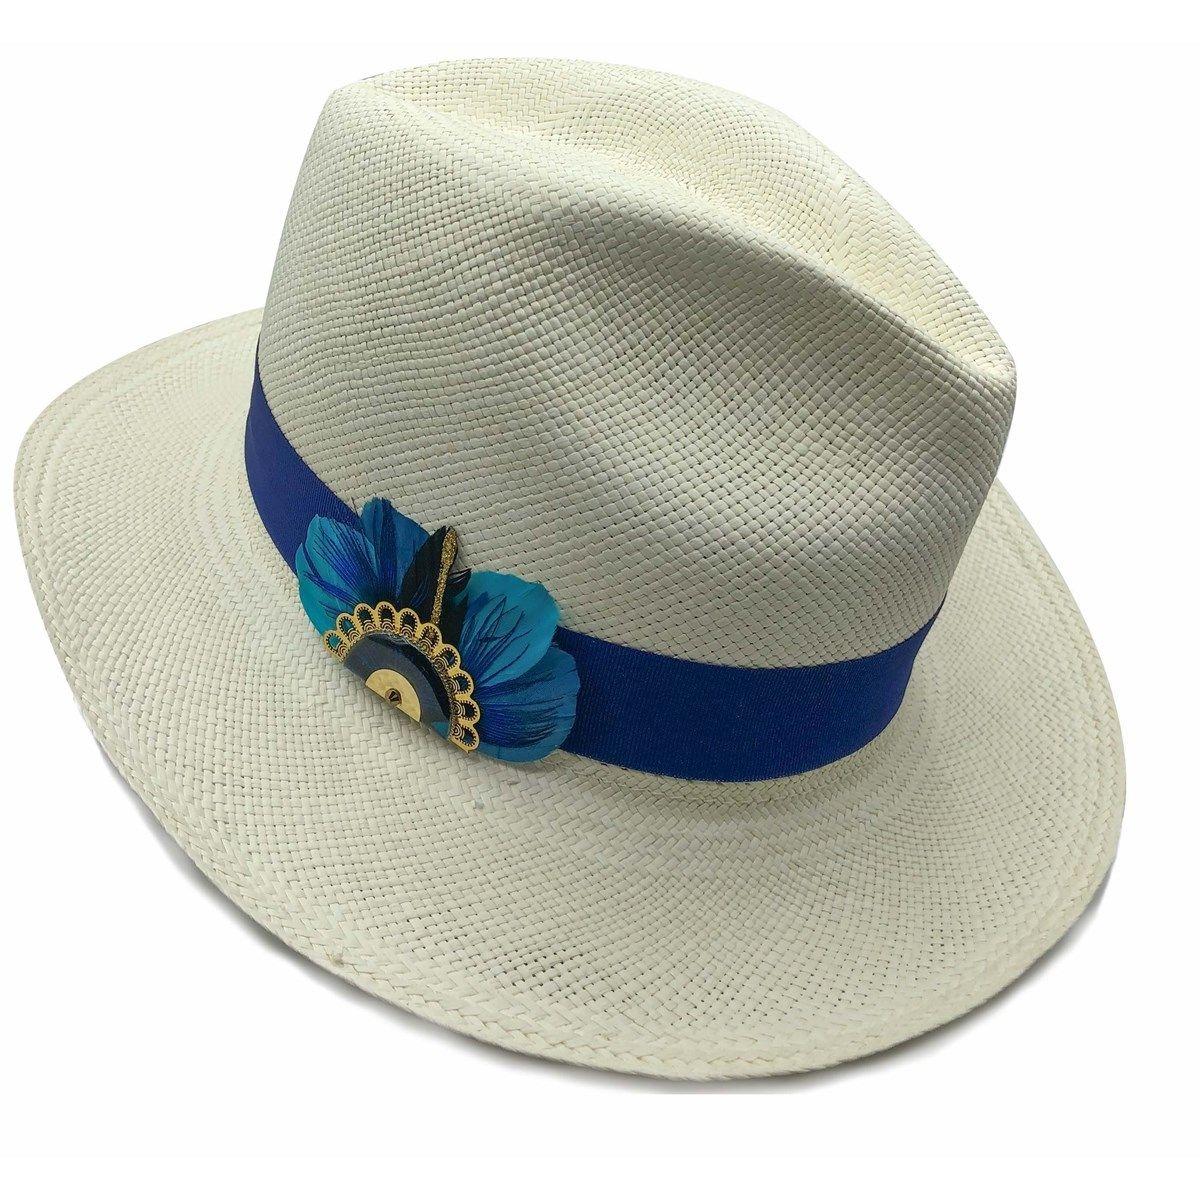 Chapeau panama en paille écru ruban interchangeable Linea et broche Gilda